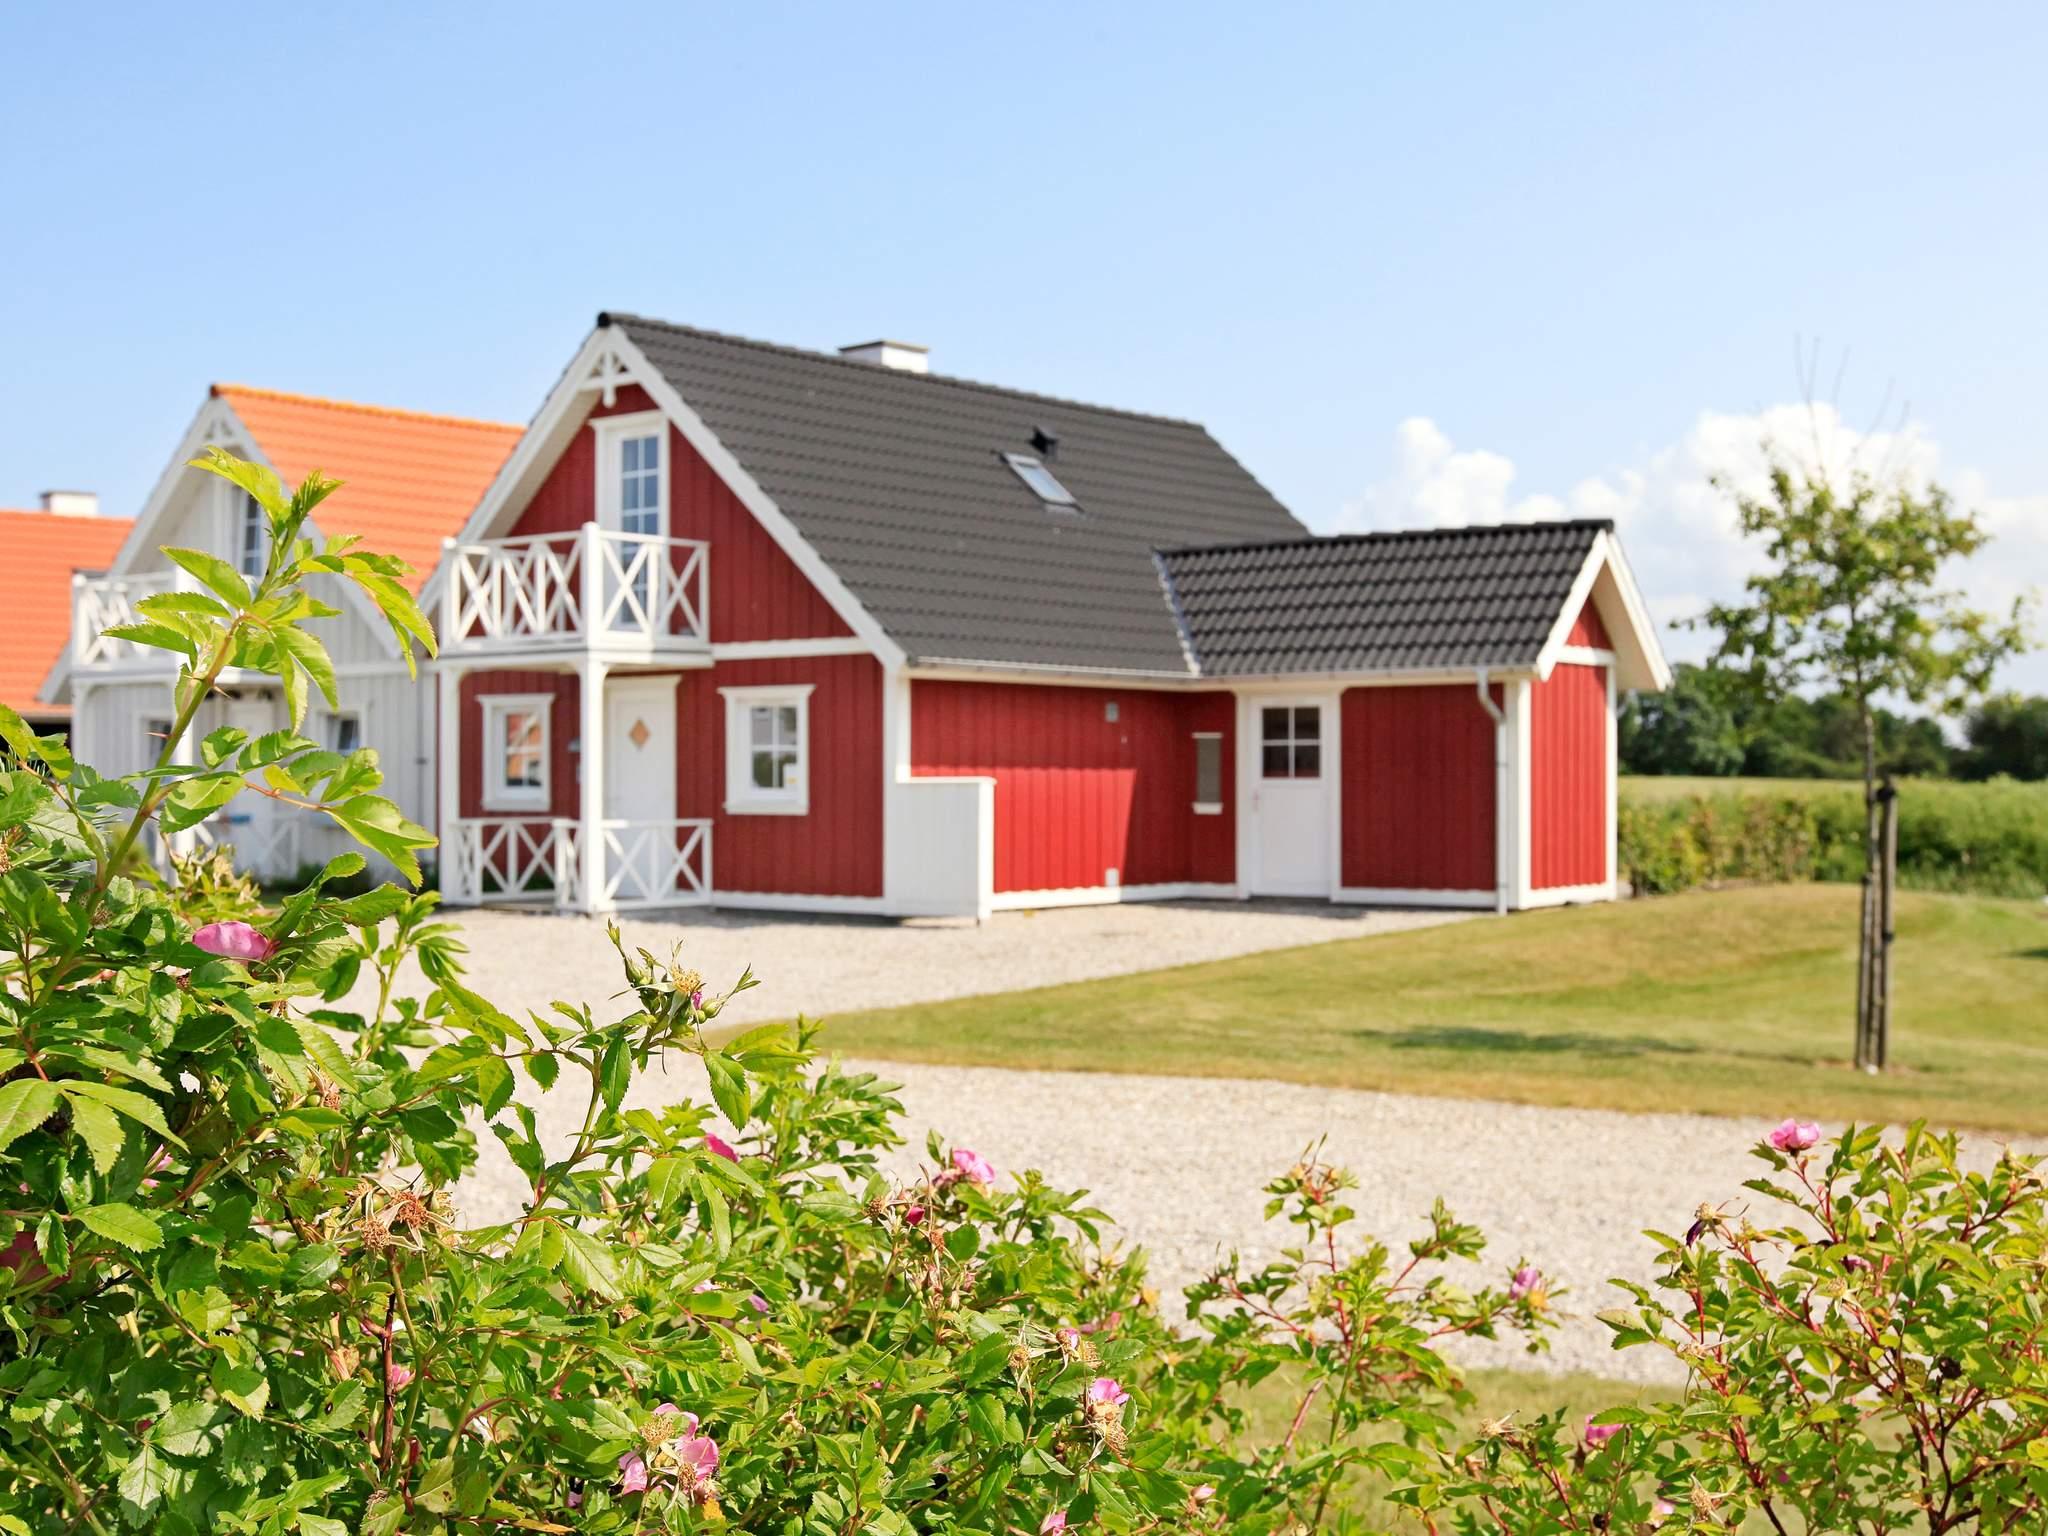 Ferienhaus Bro Strand (495161), Bro (DK), , Fünen, Dänemark, Bild 21